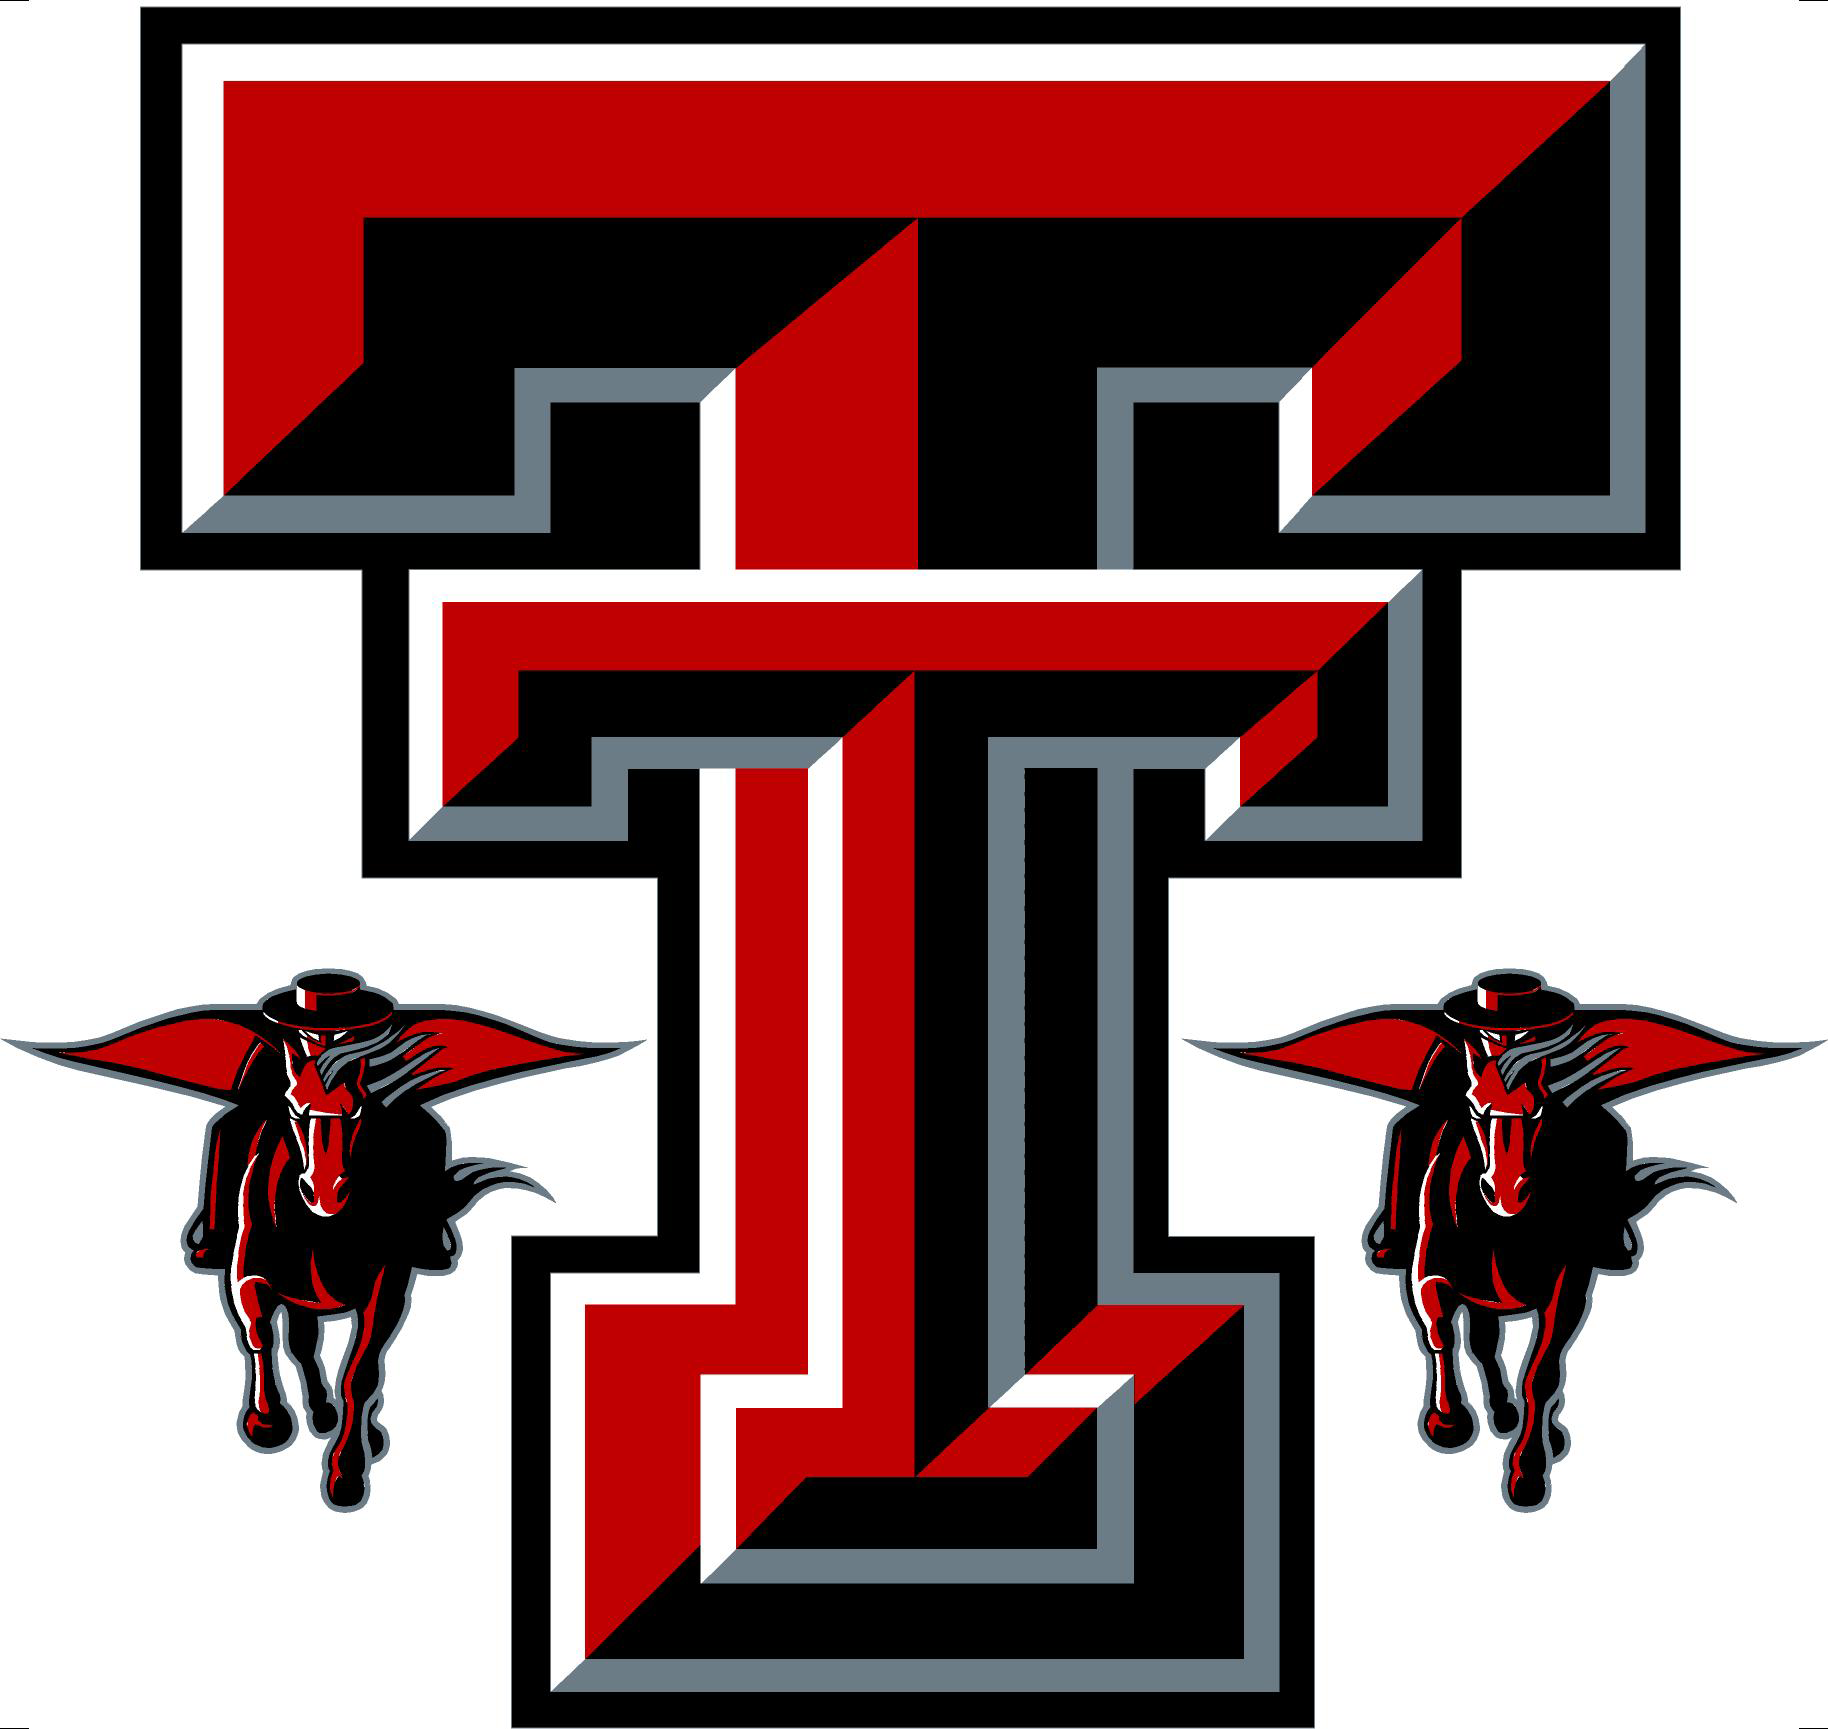 Texas tech clipart jpg royalty free Free Texas Tech Logo, Download Free Clip Art, Free Clip Art ... jpg royalty free